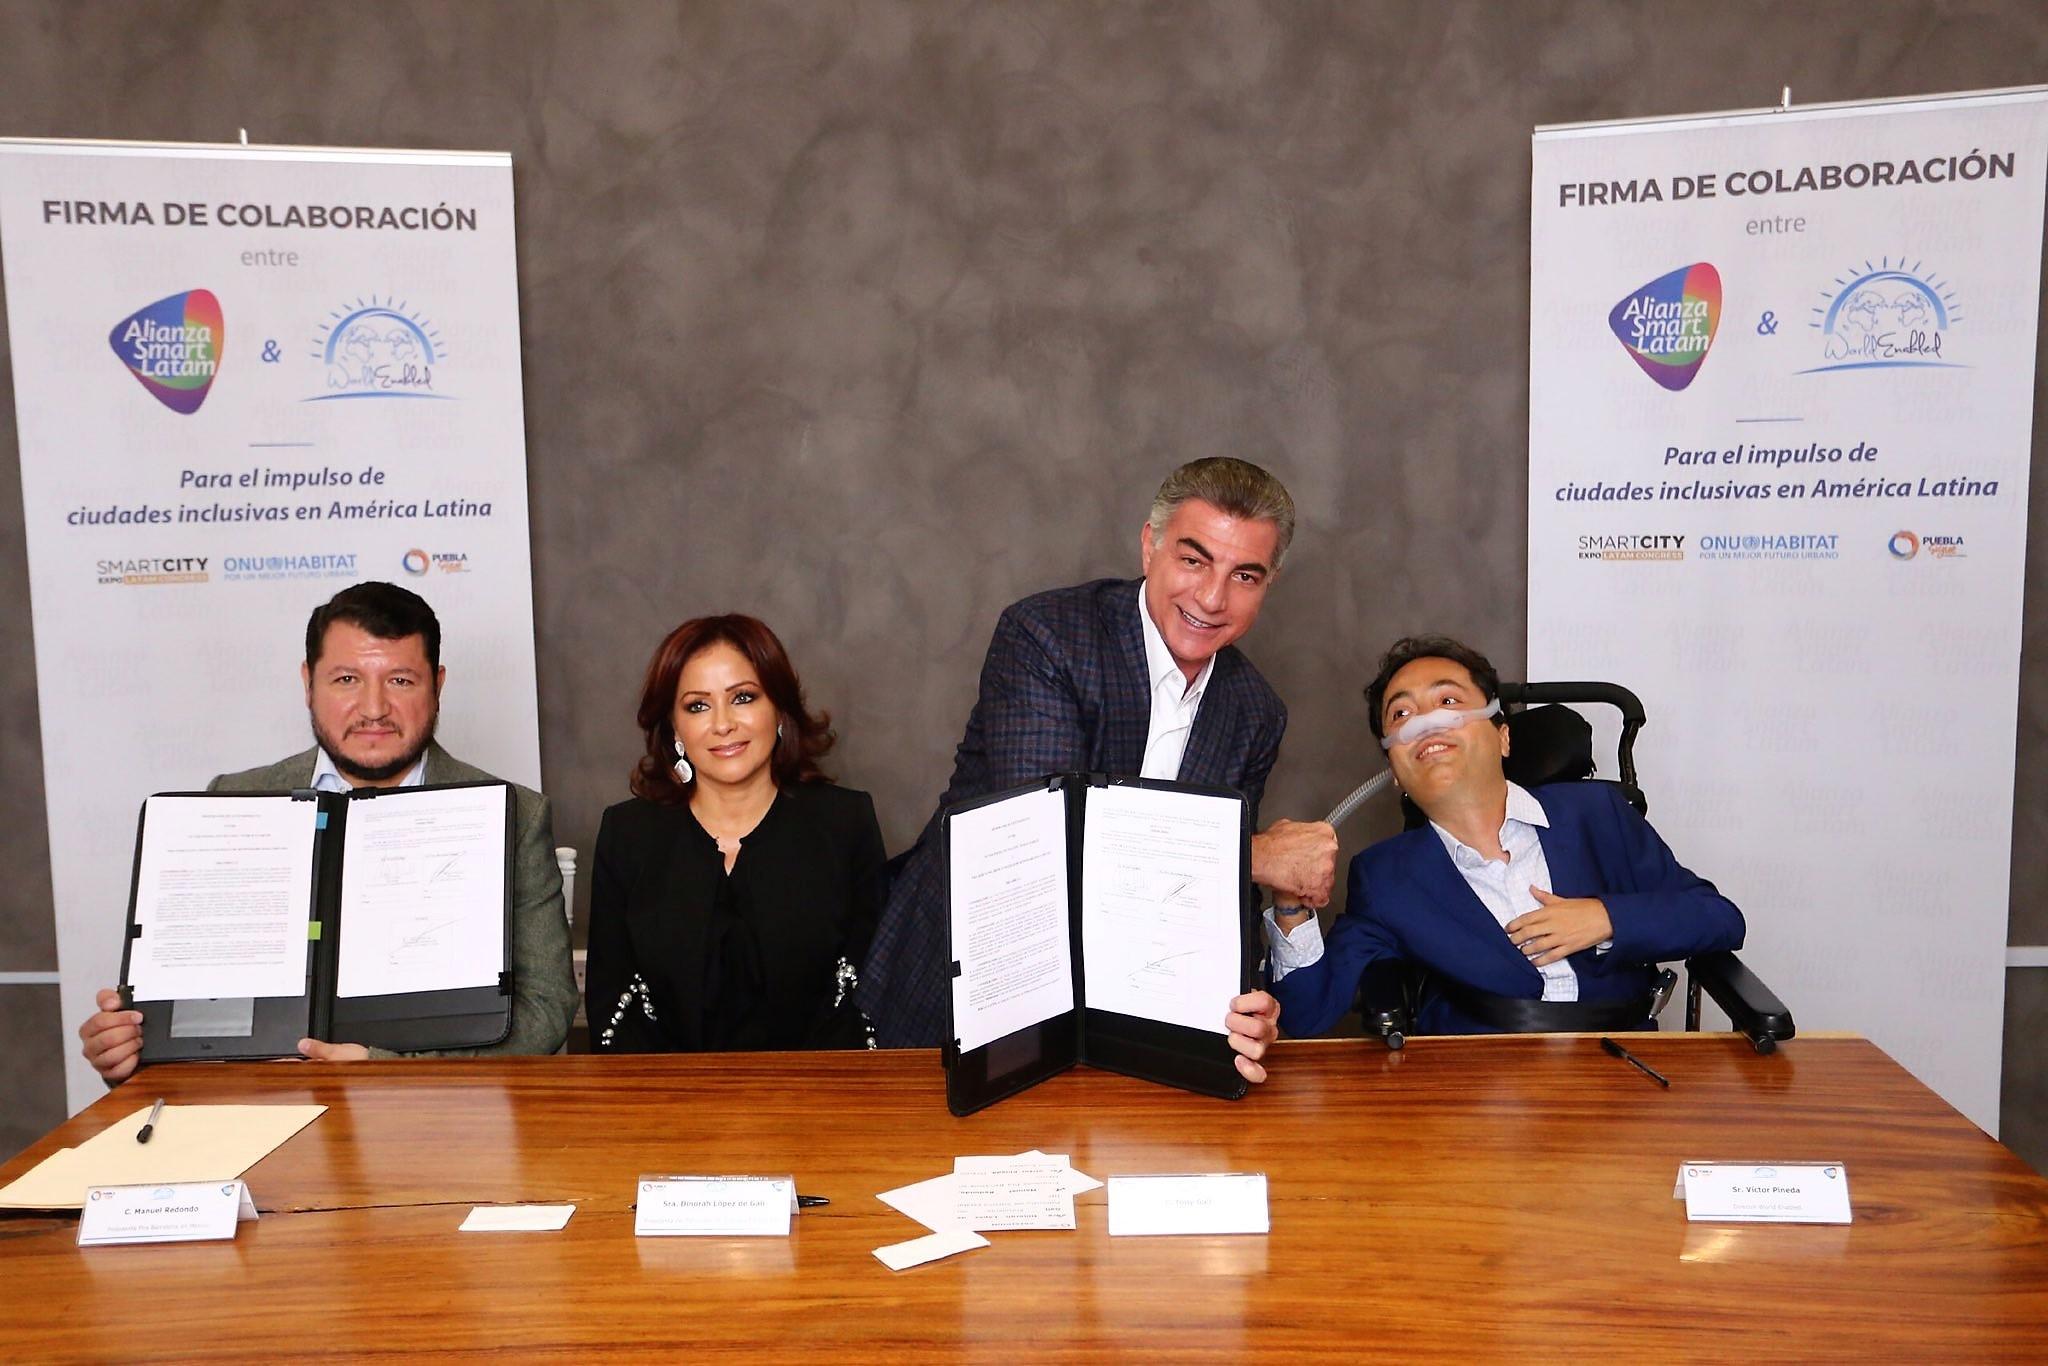 Firmado convenio para promover ciudades inclusivas en América Latina